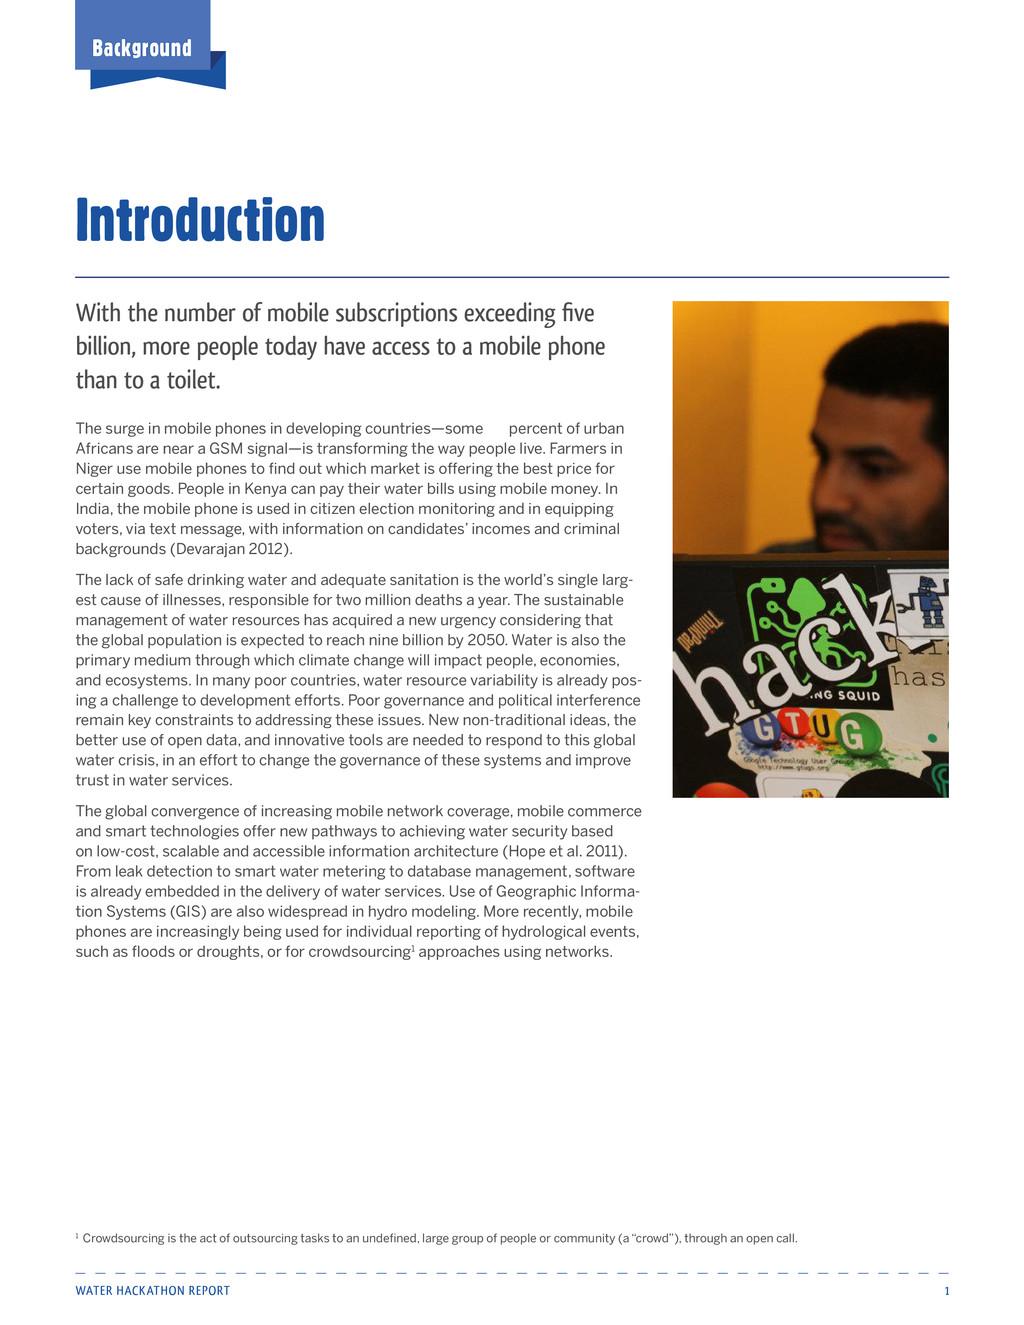 Water Hackathon Report 1 Background Introductio...